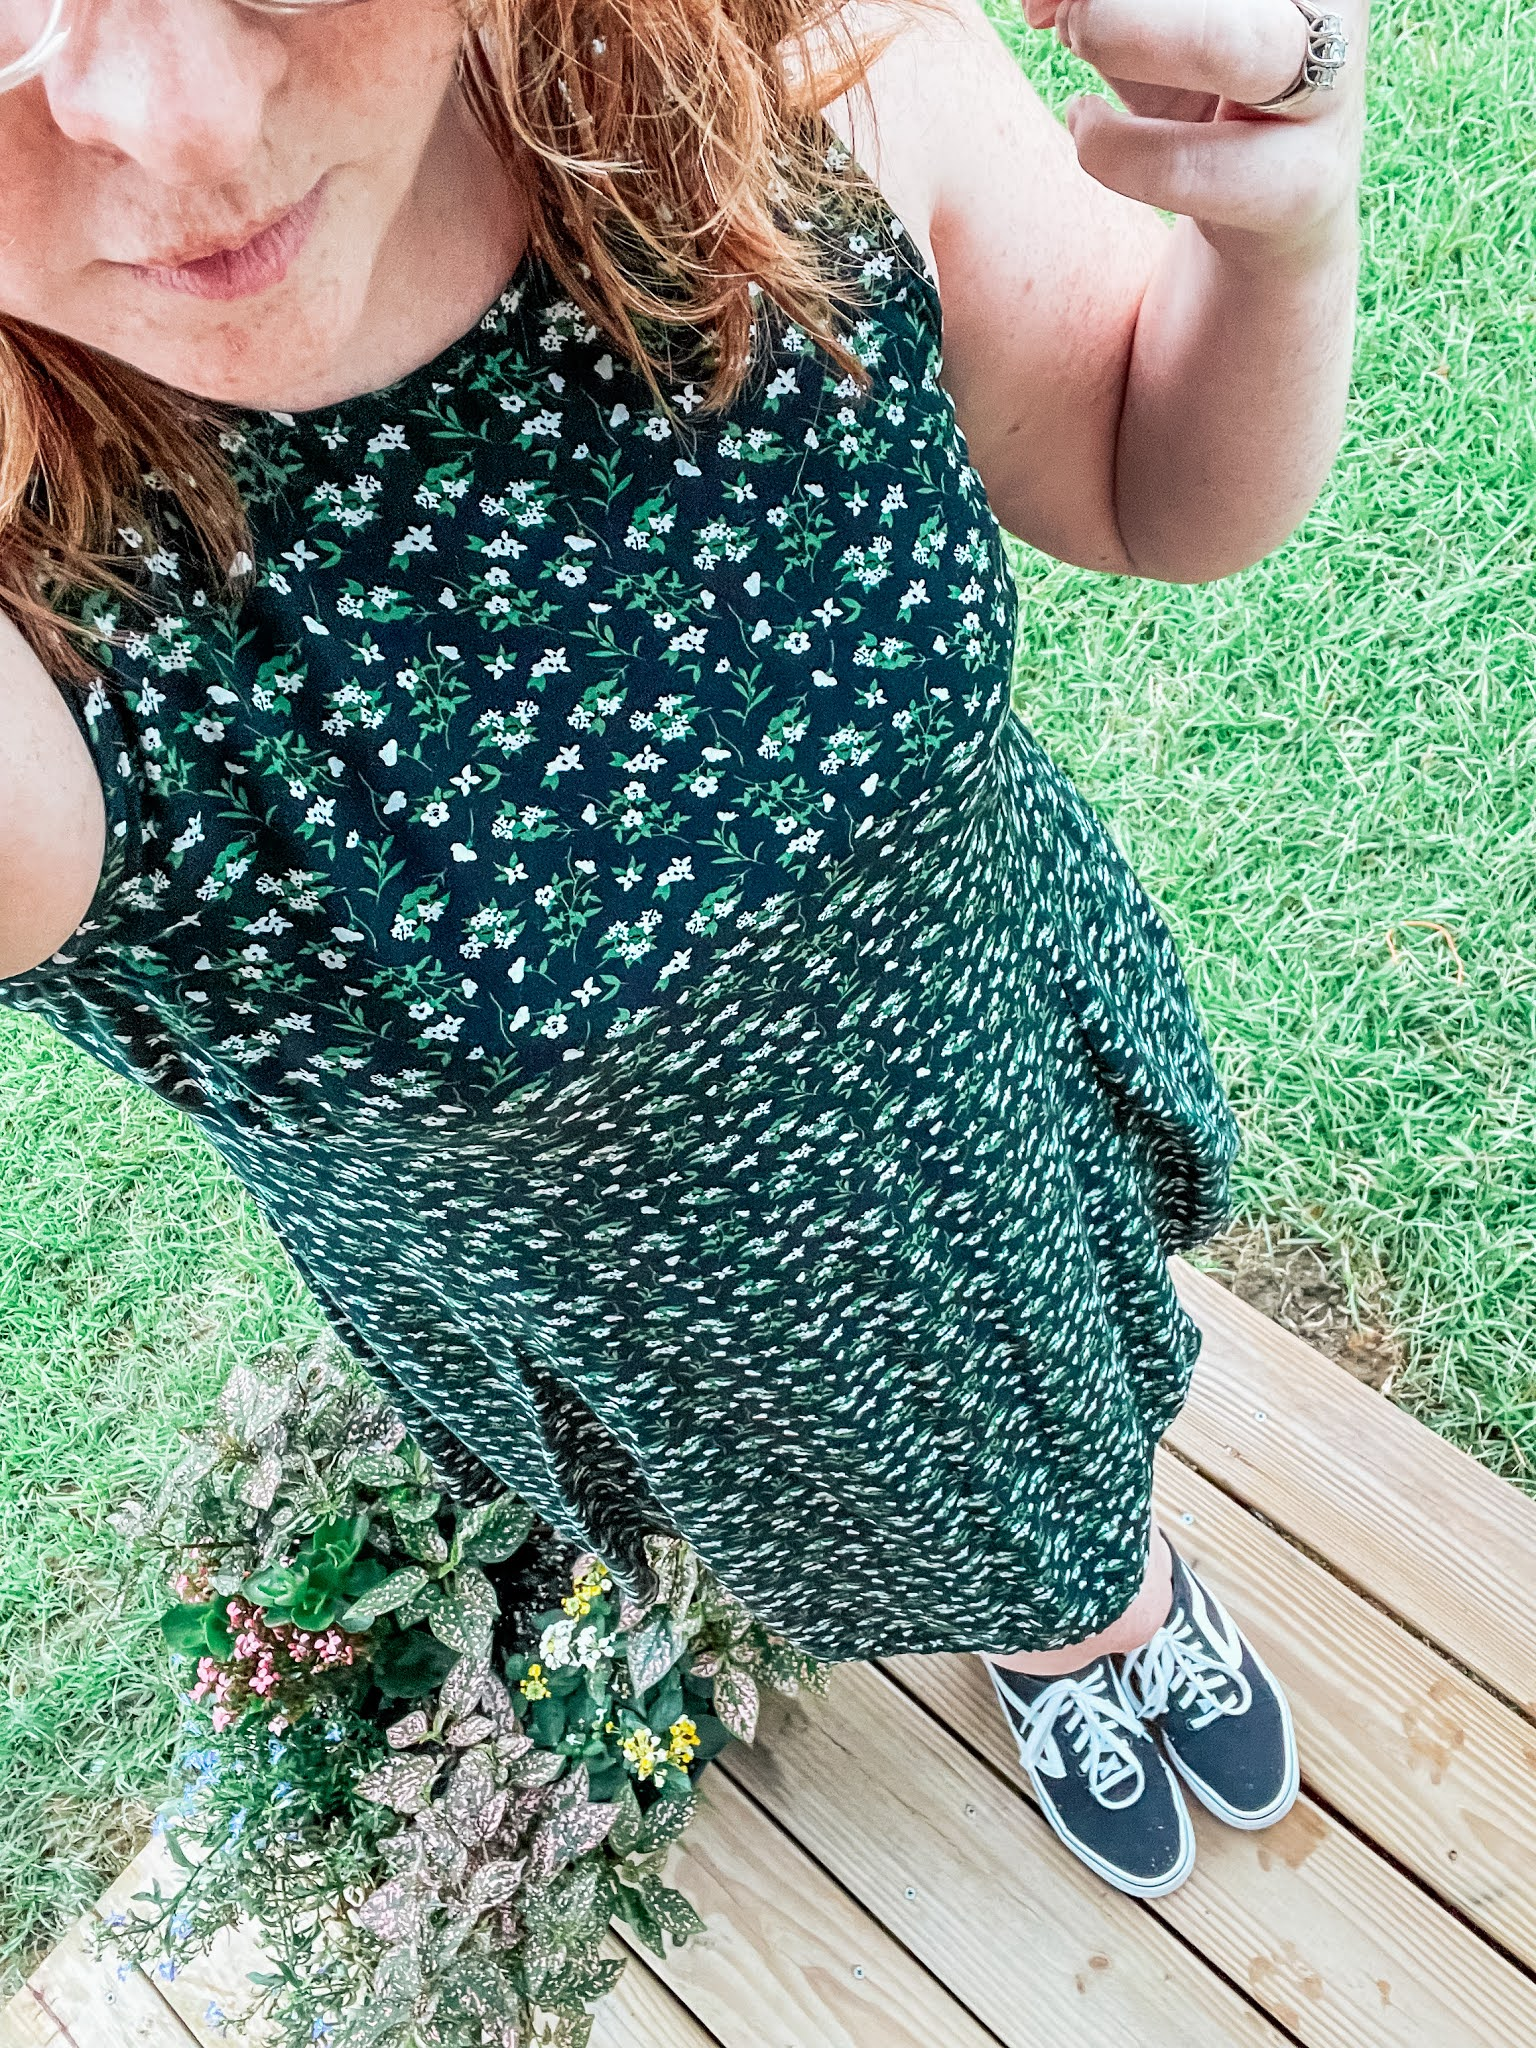 floral-dress-retro-sneakers